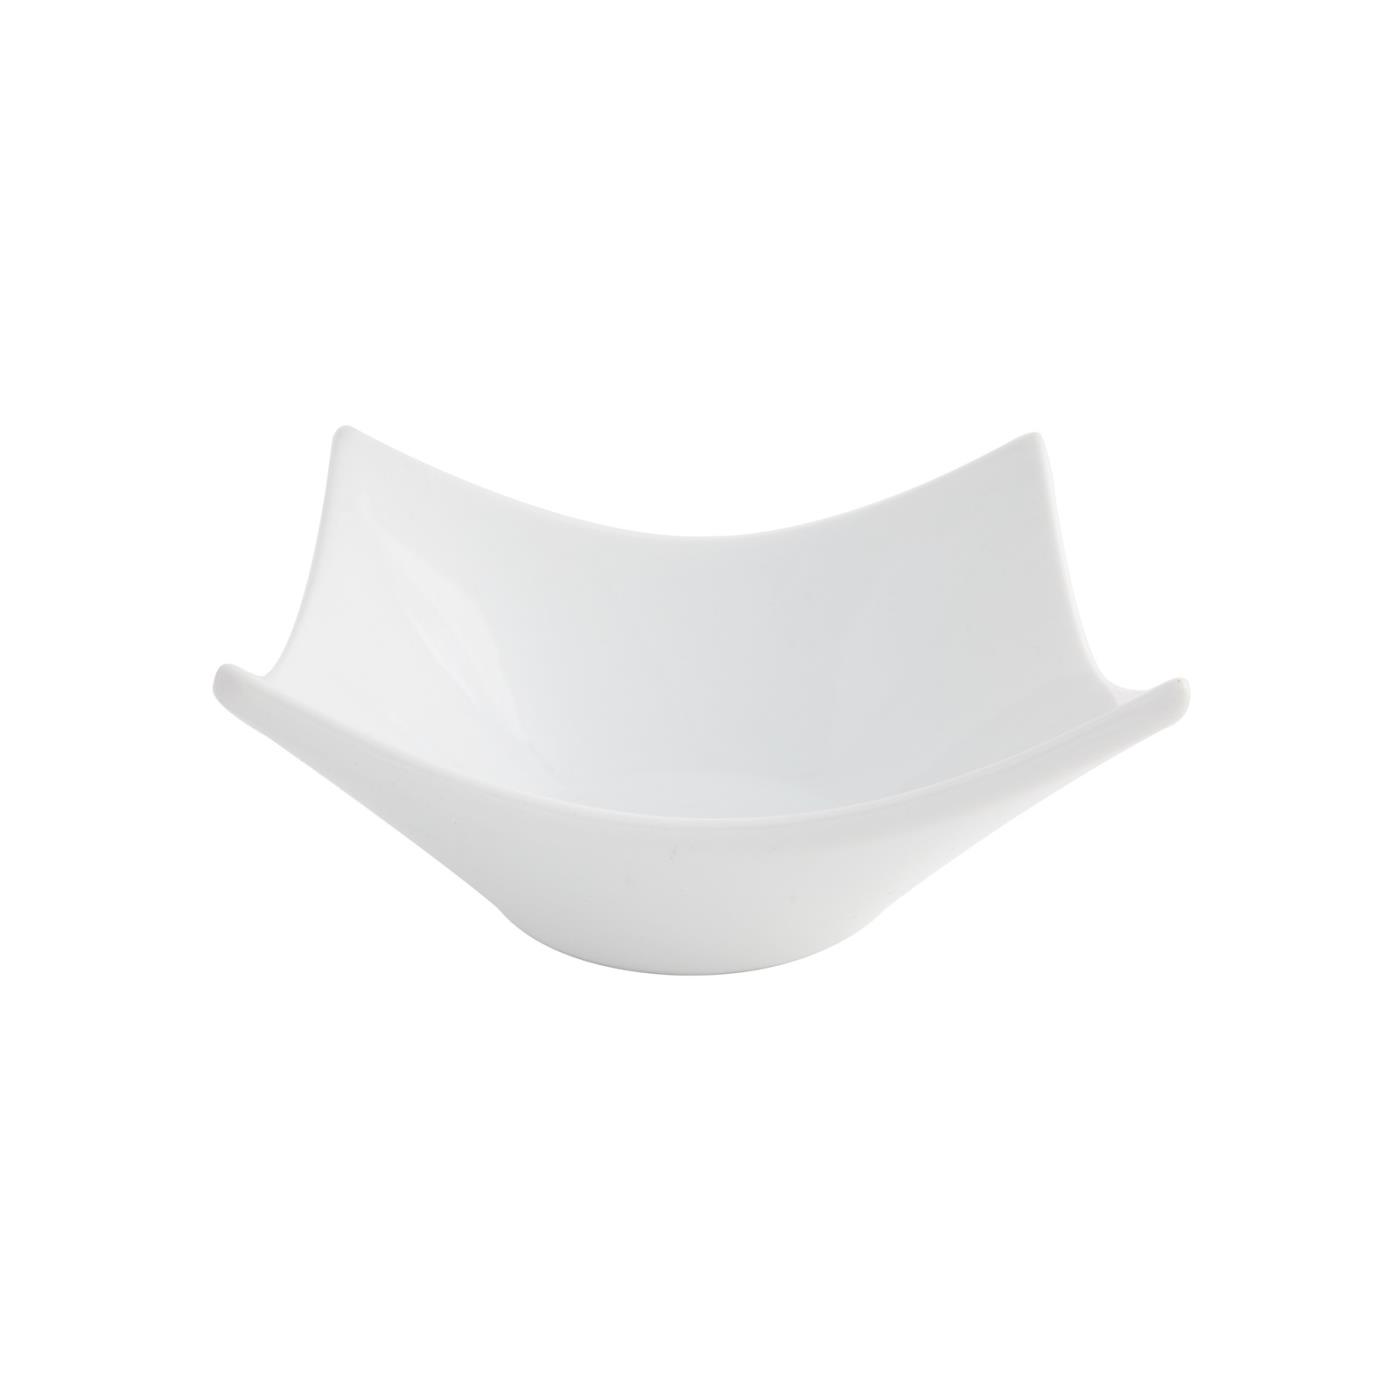 "White Square Origami Dish - 5"""